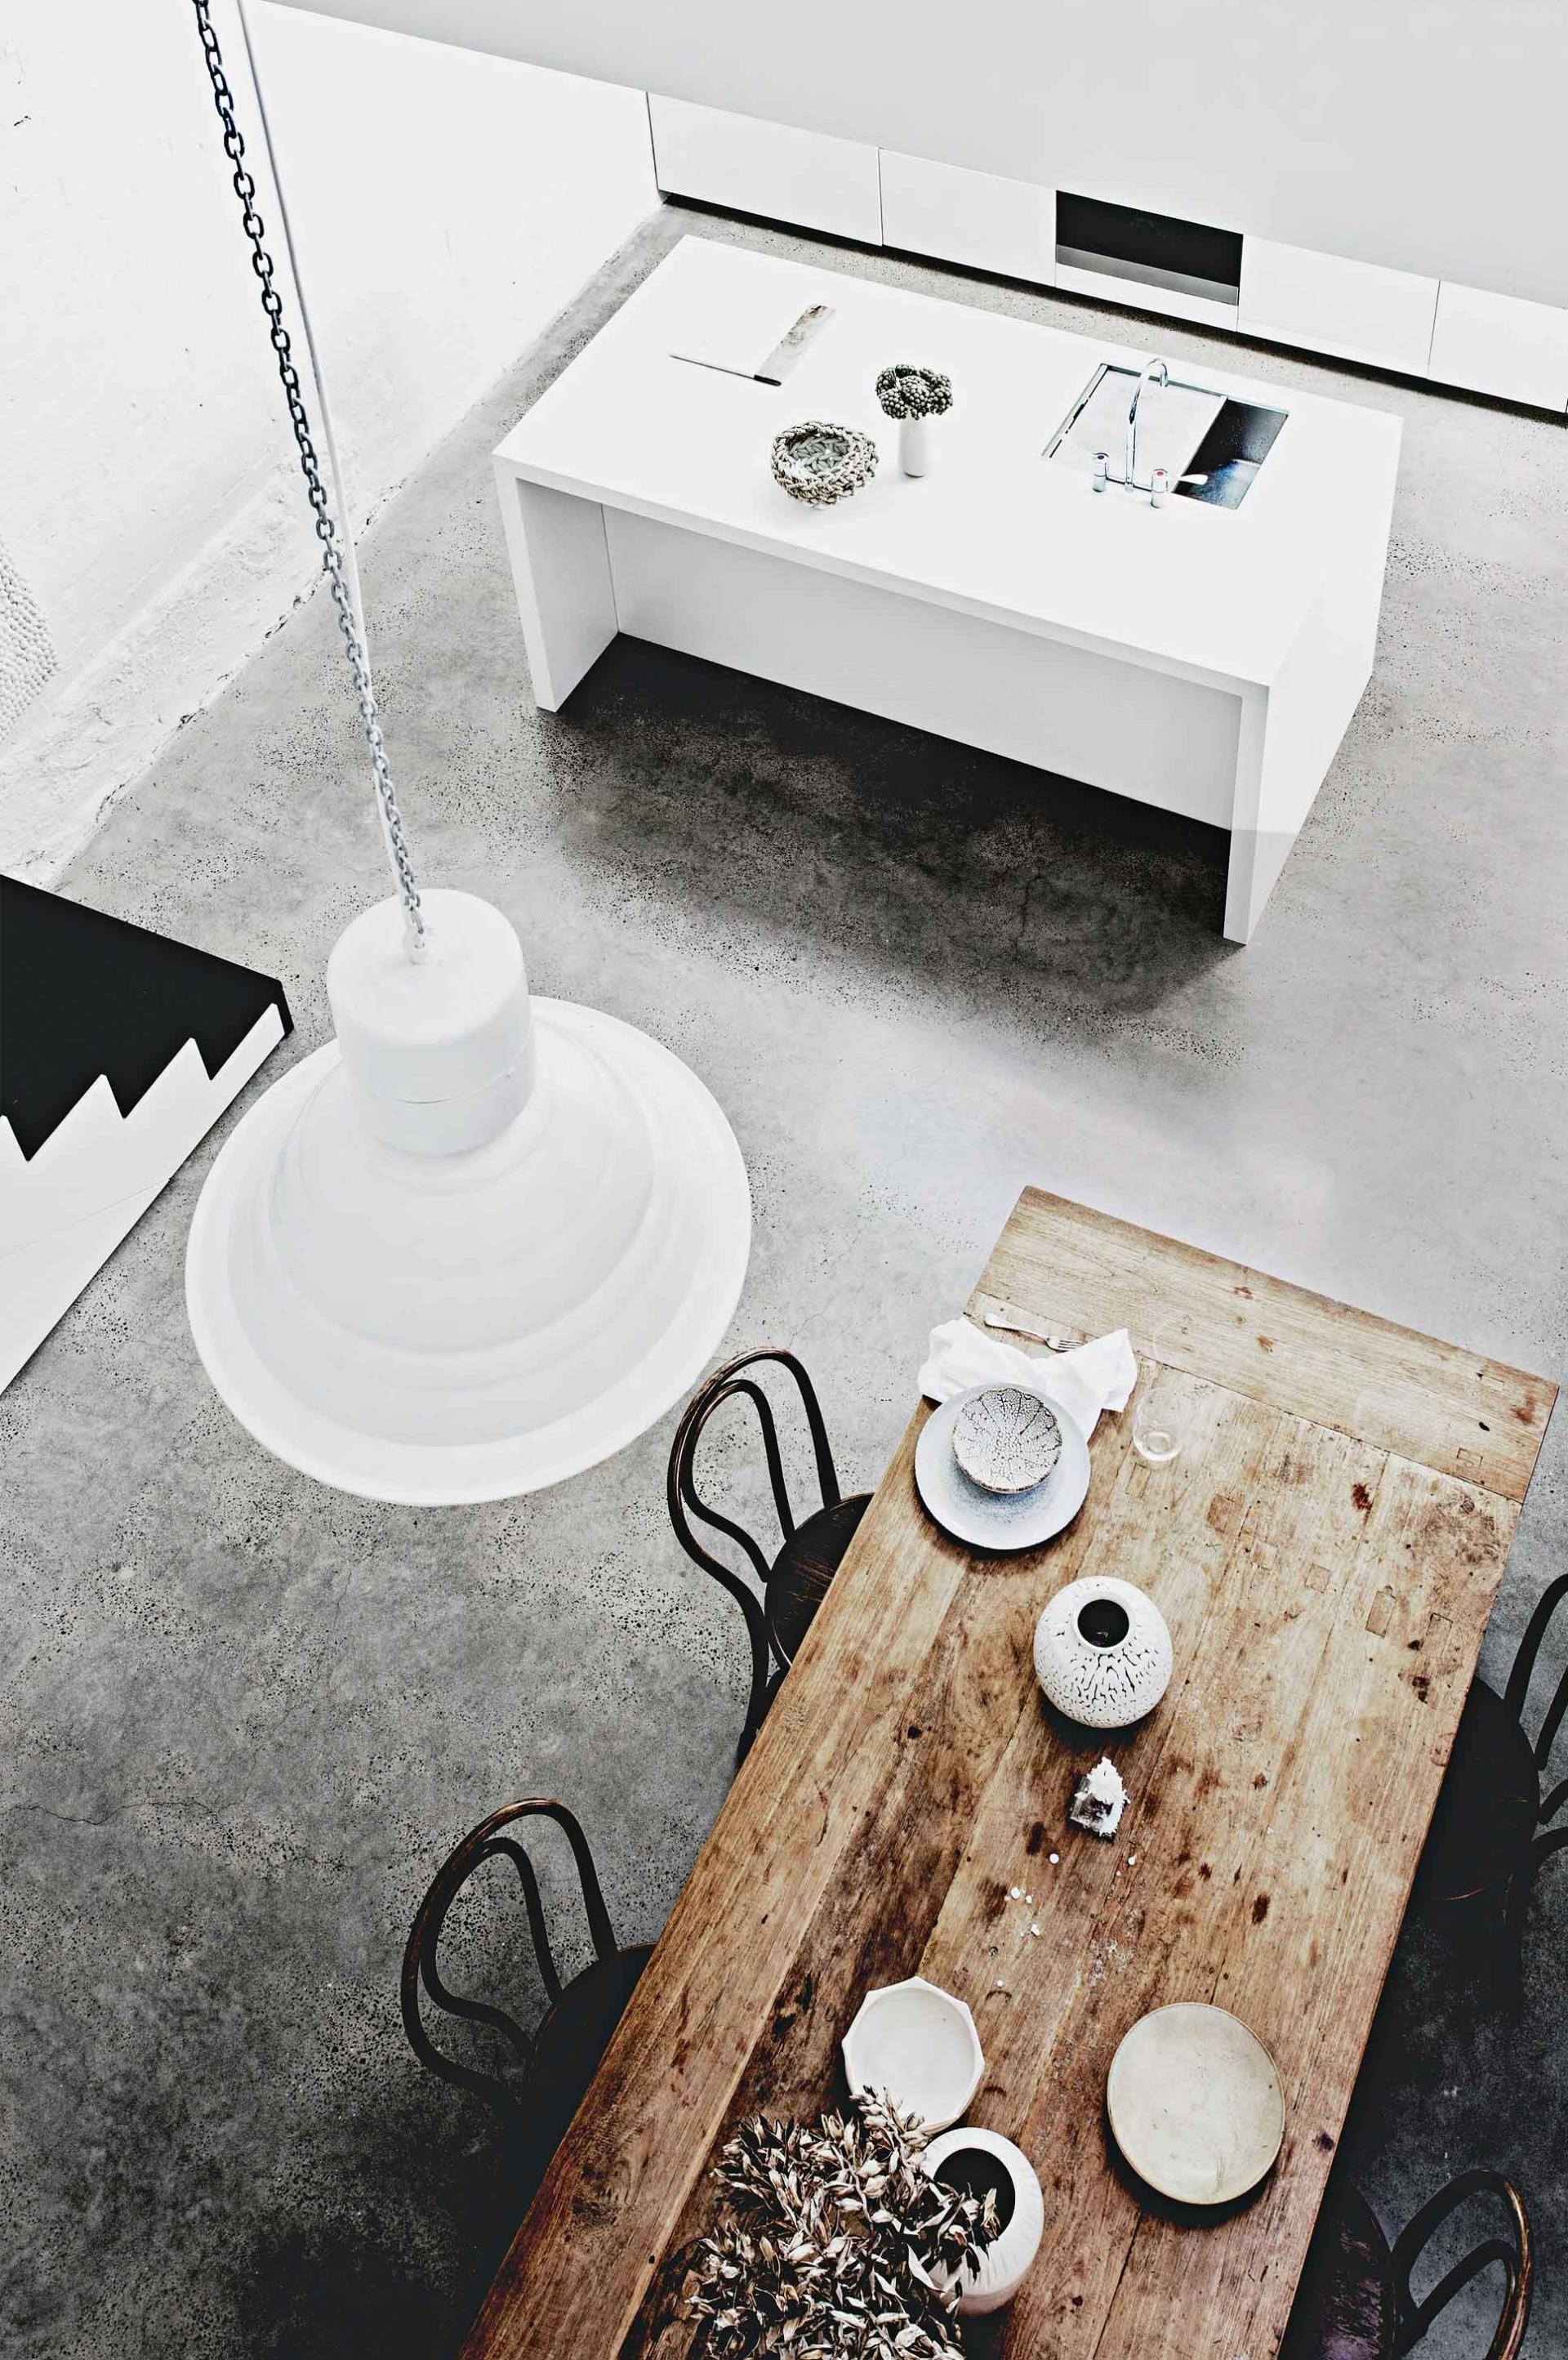 the minimalistic home of architect William Drew